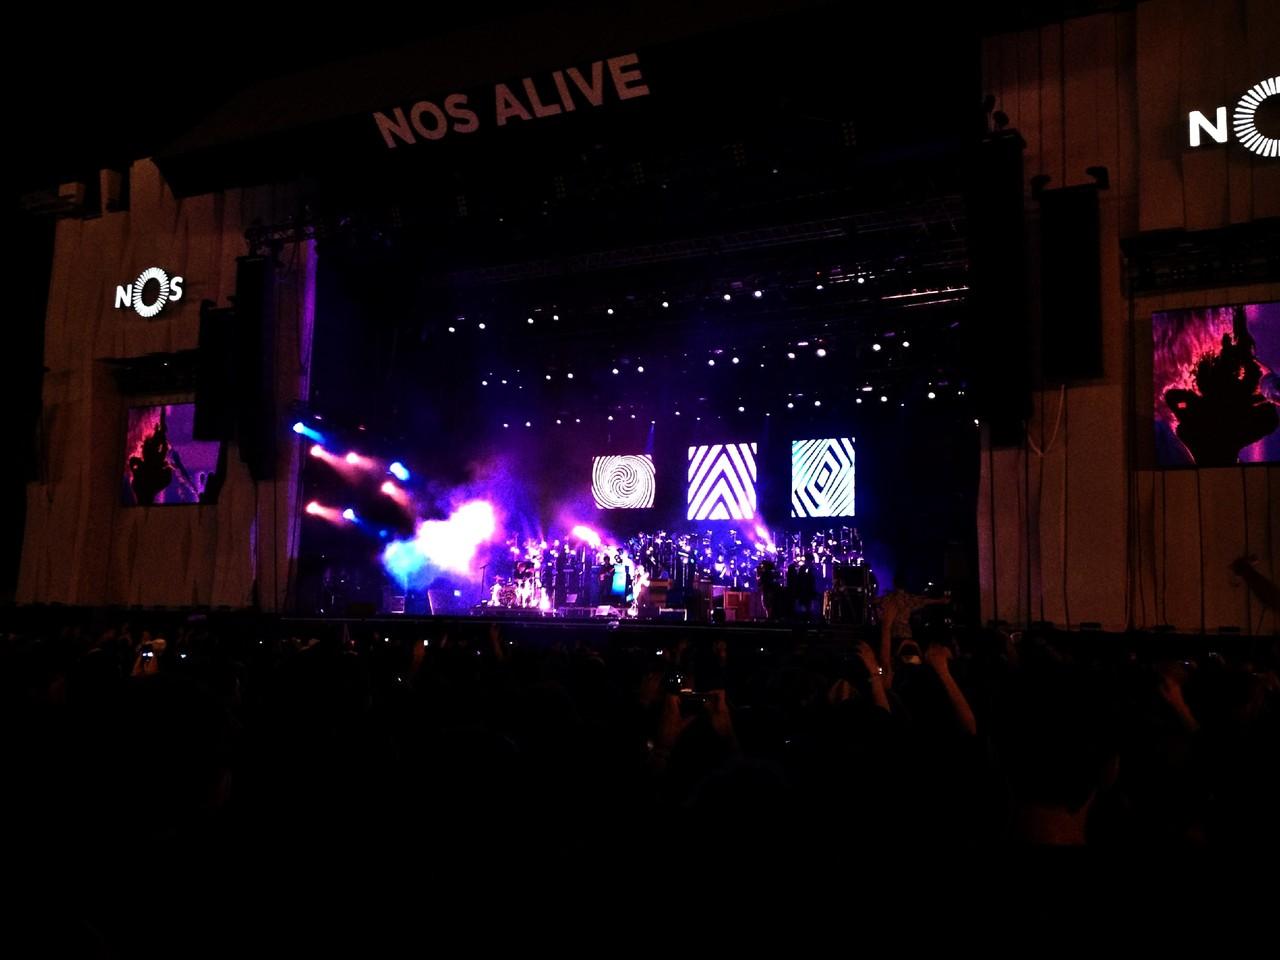 nos-alive